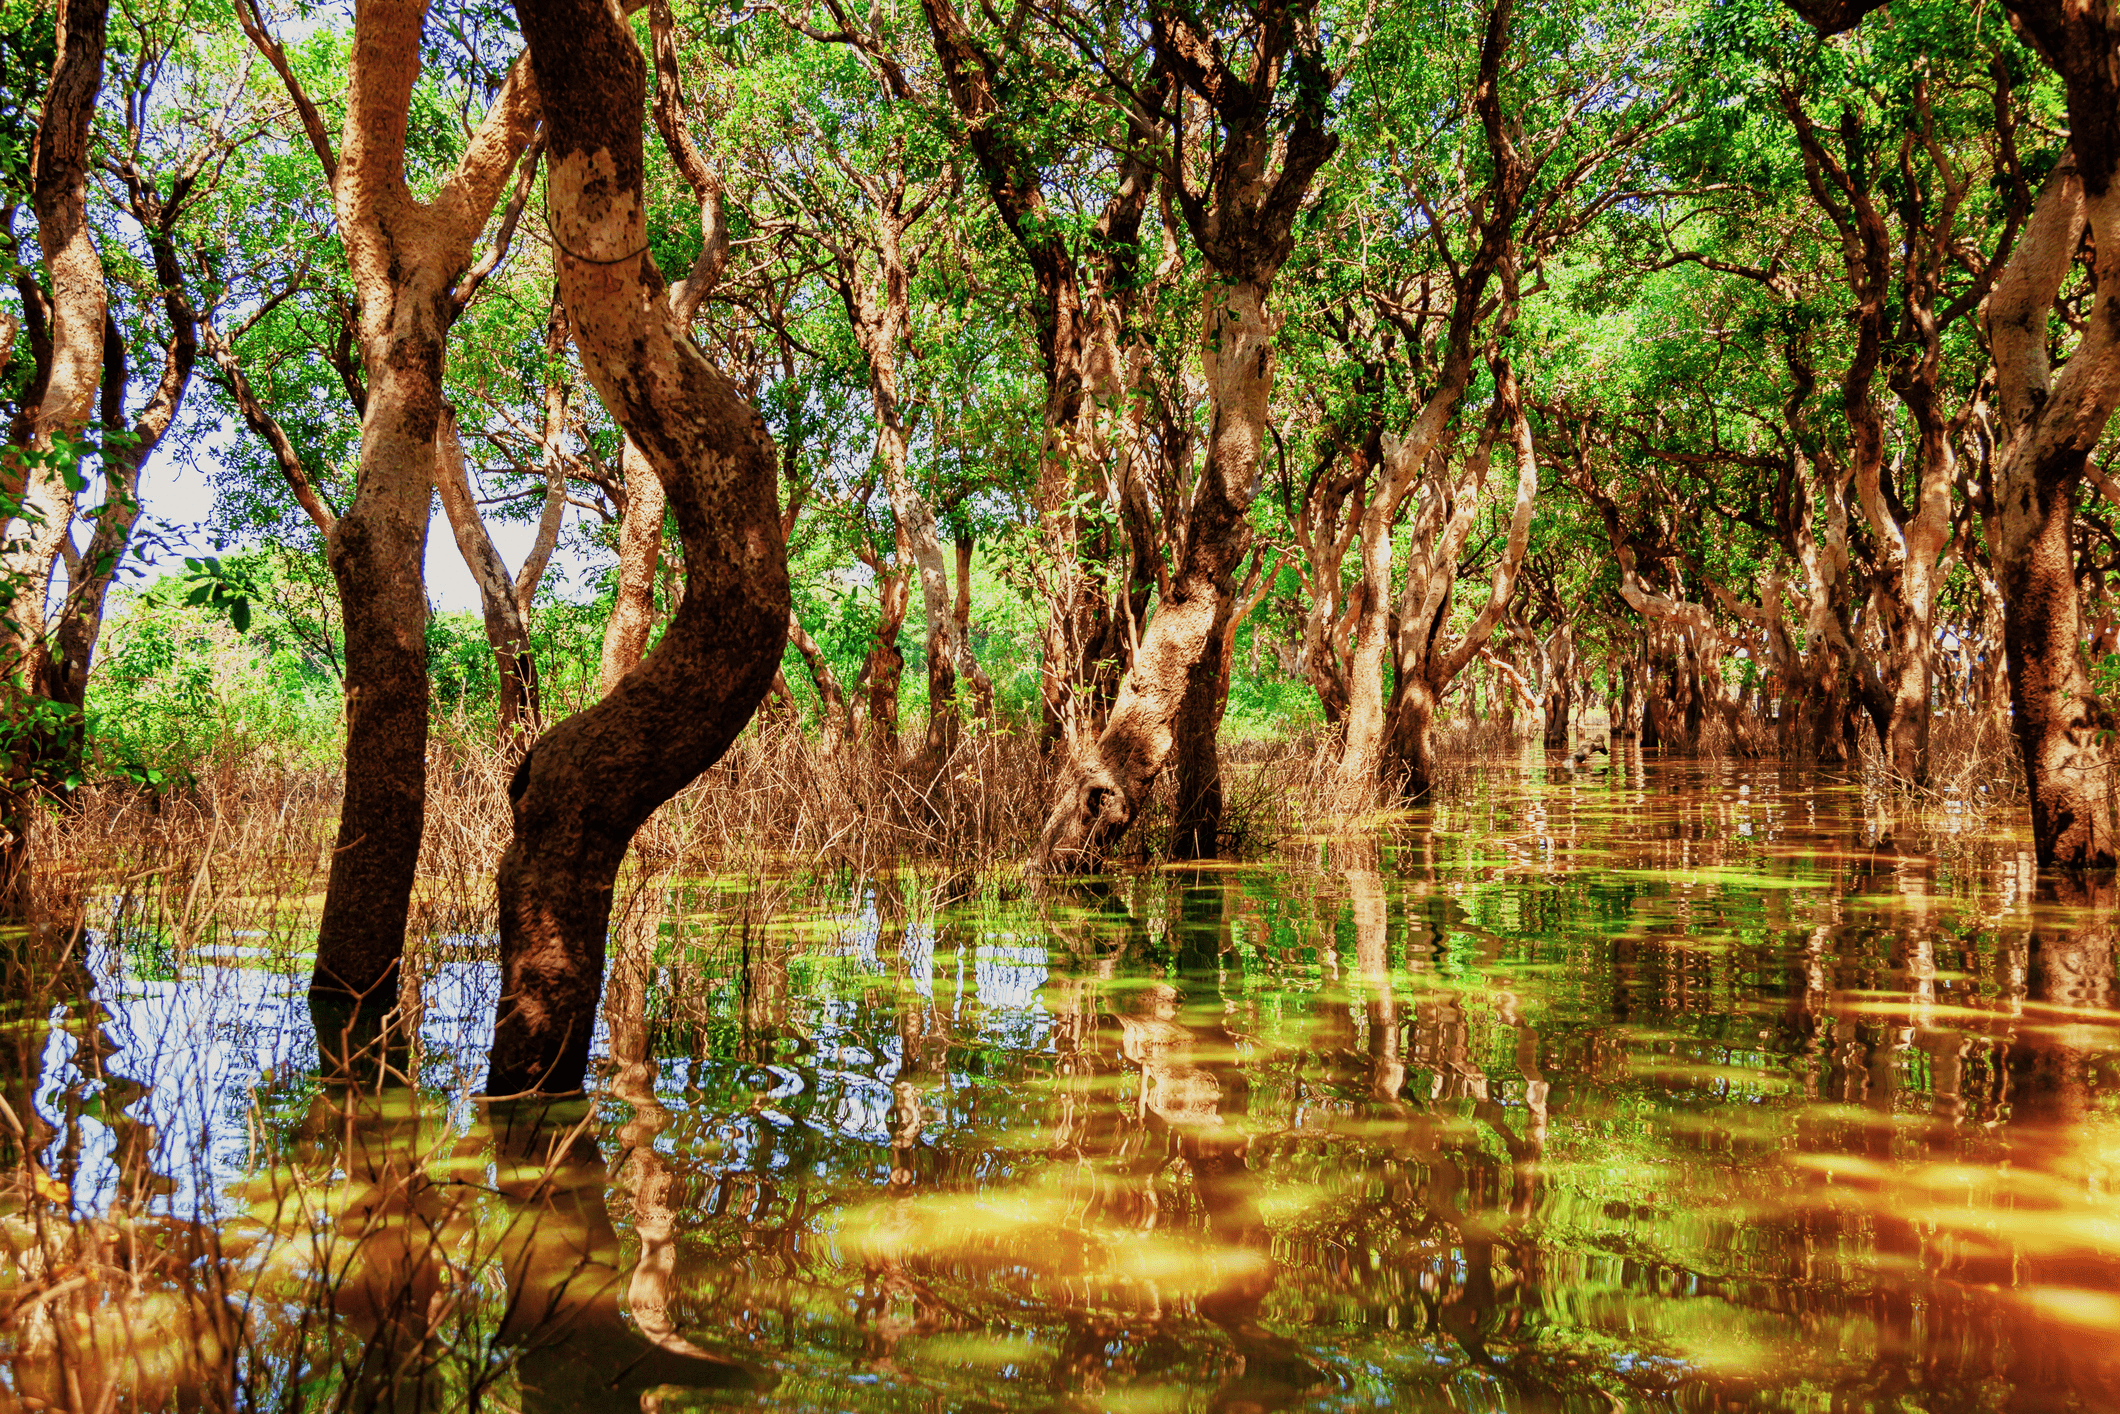 Mangrove trees in a stream.